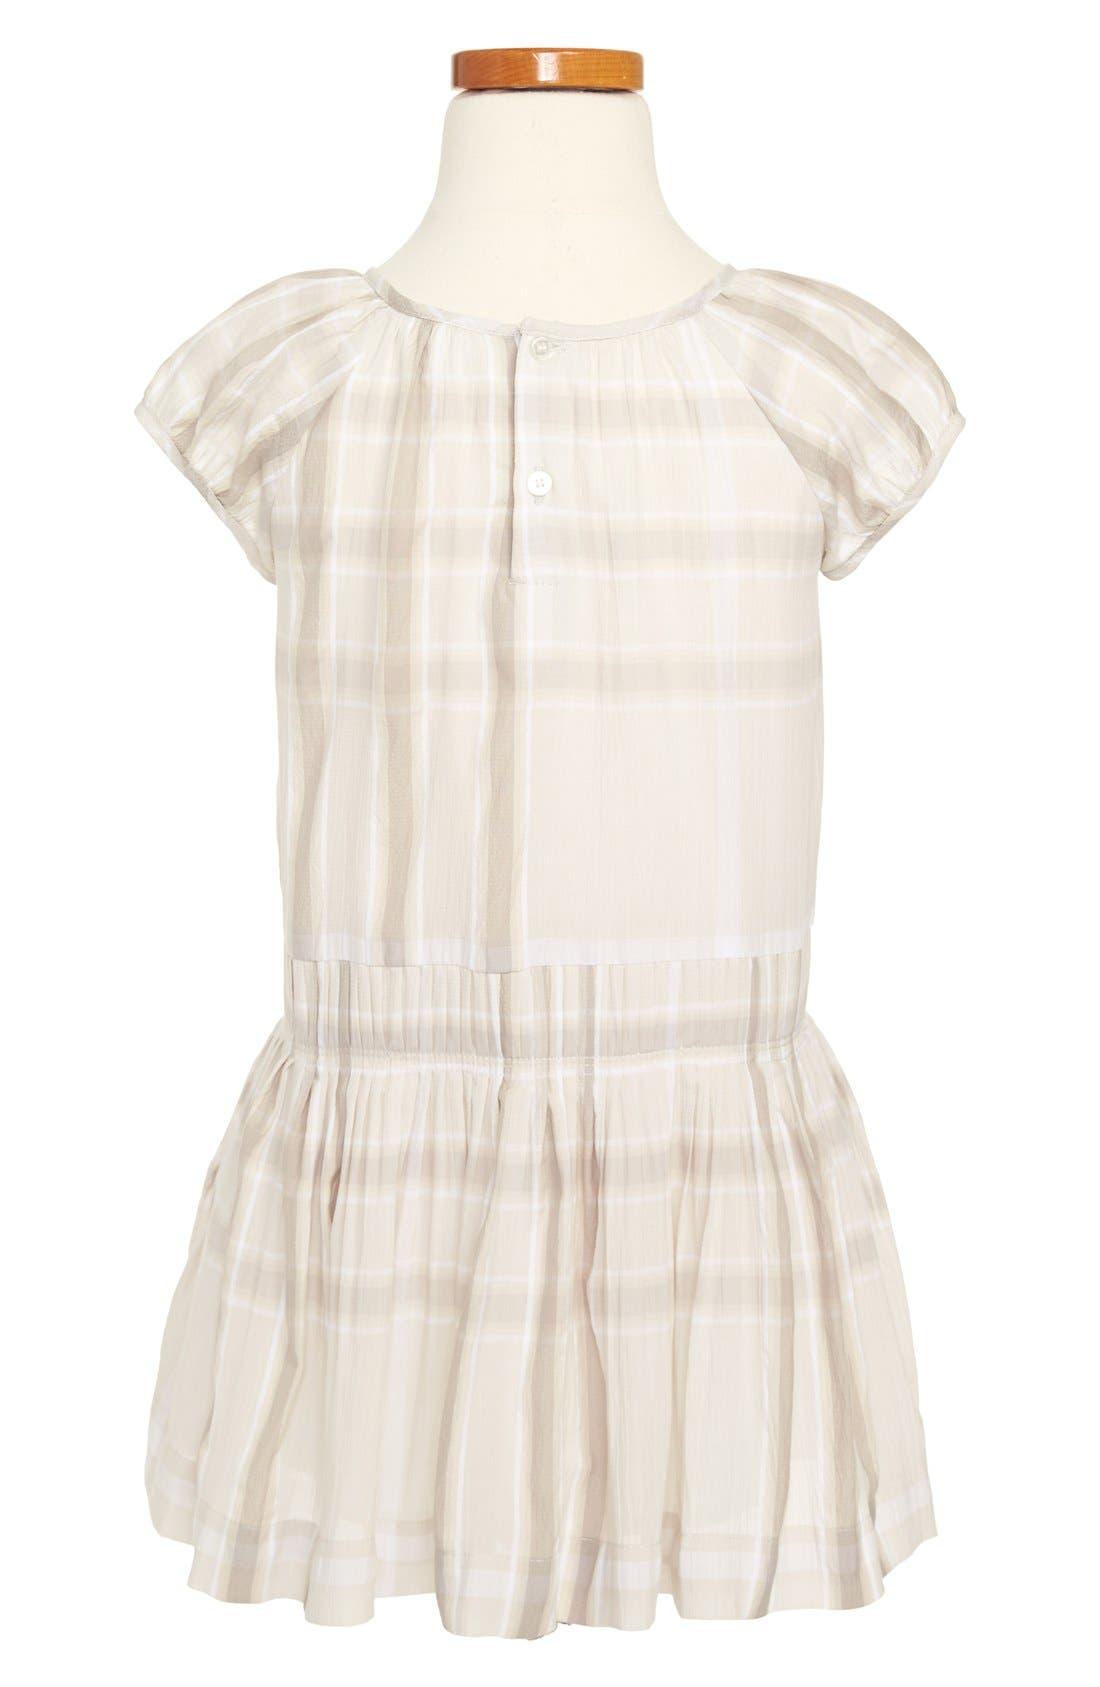 BURBERRY,                             'Edemme' Dress,                             Alternate thumbnail 2, color,                             250